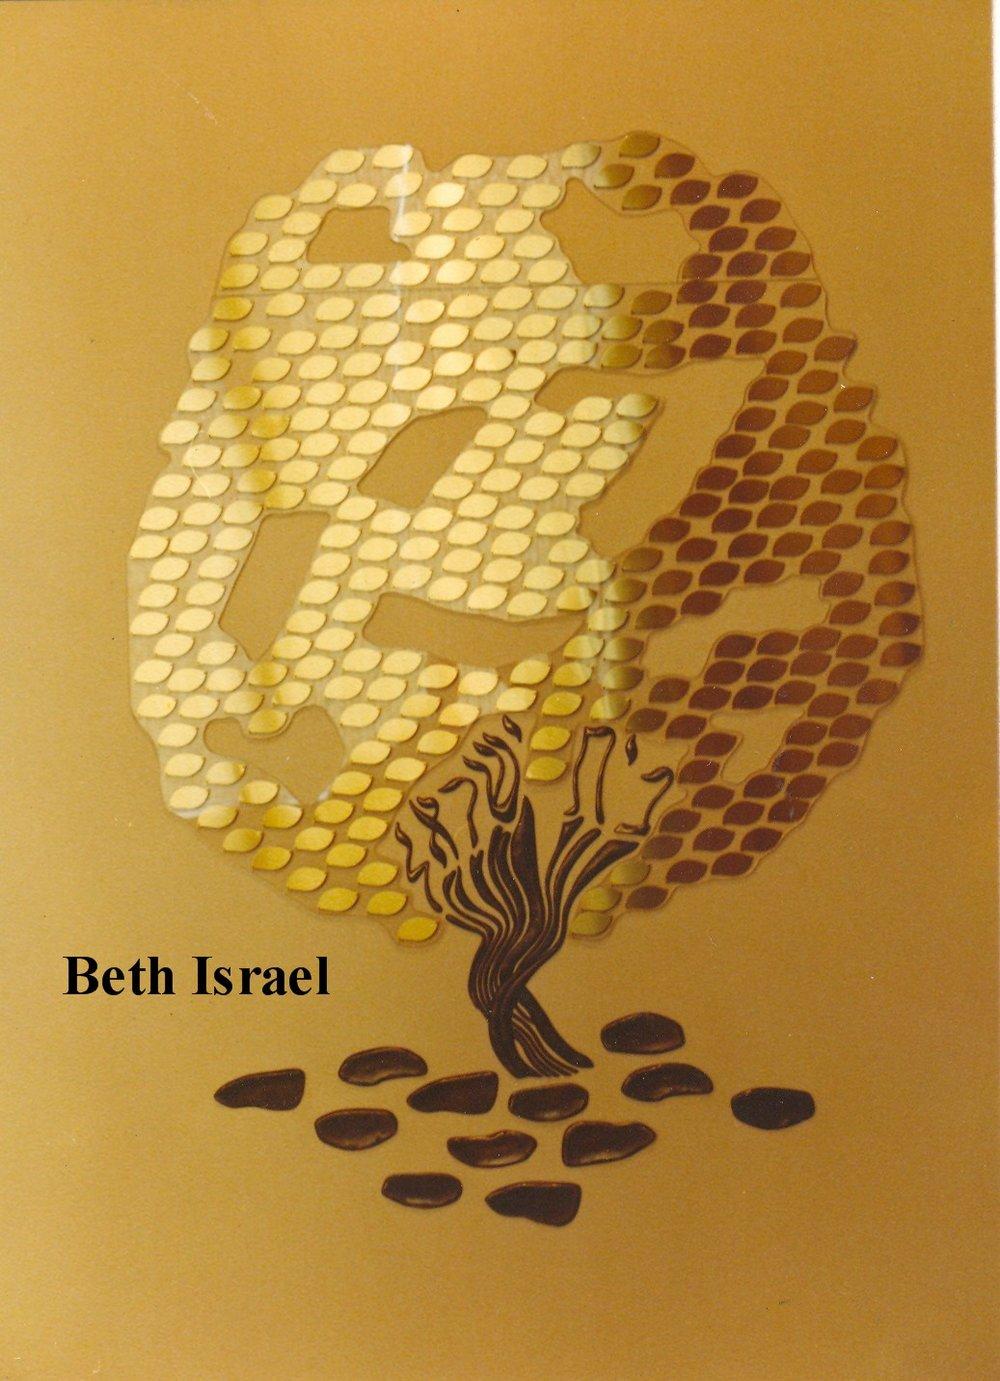 Beth Israel Tree.jpg